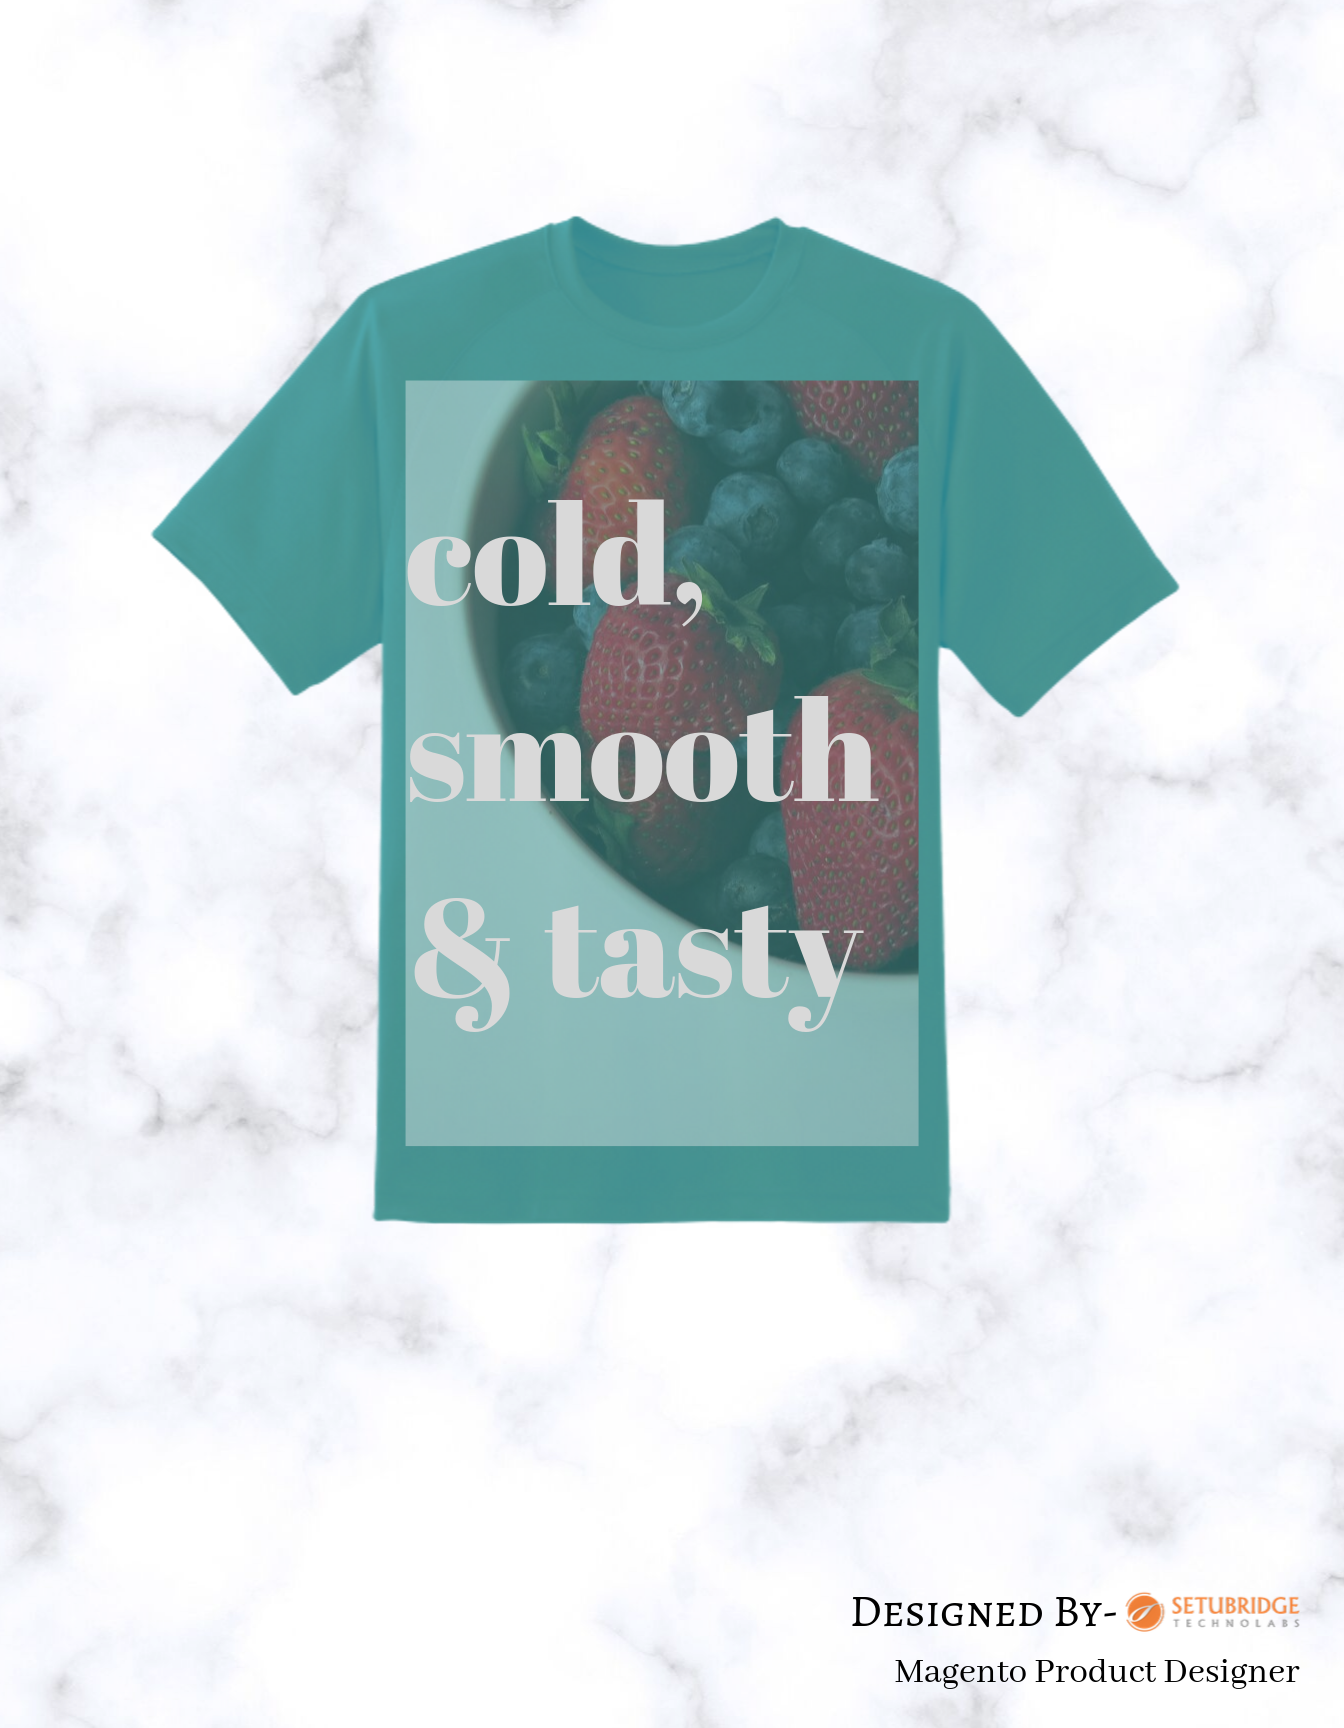 T Shirt Design Software Magento 2 Best Online T Shirt Design Tool 2020 Setubridge In 2020 T Shirt Design Software Custom Tshirt Design Tshirt Designs